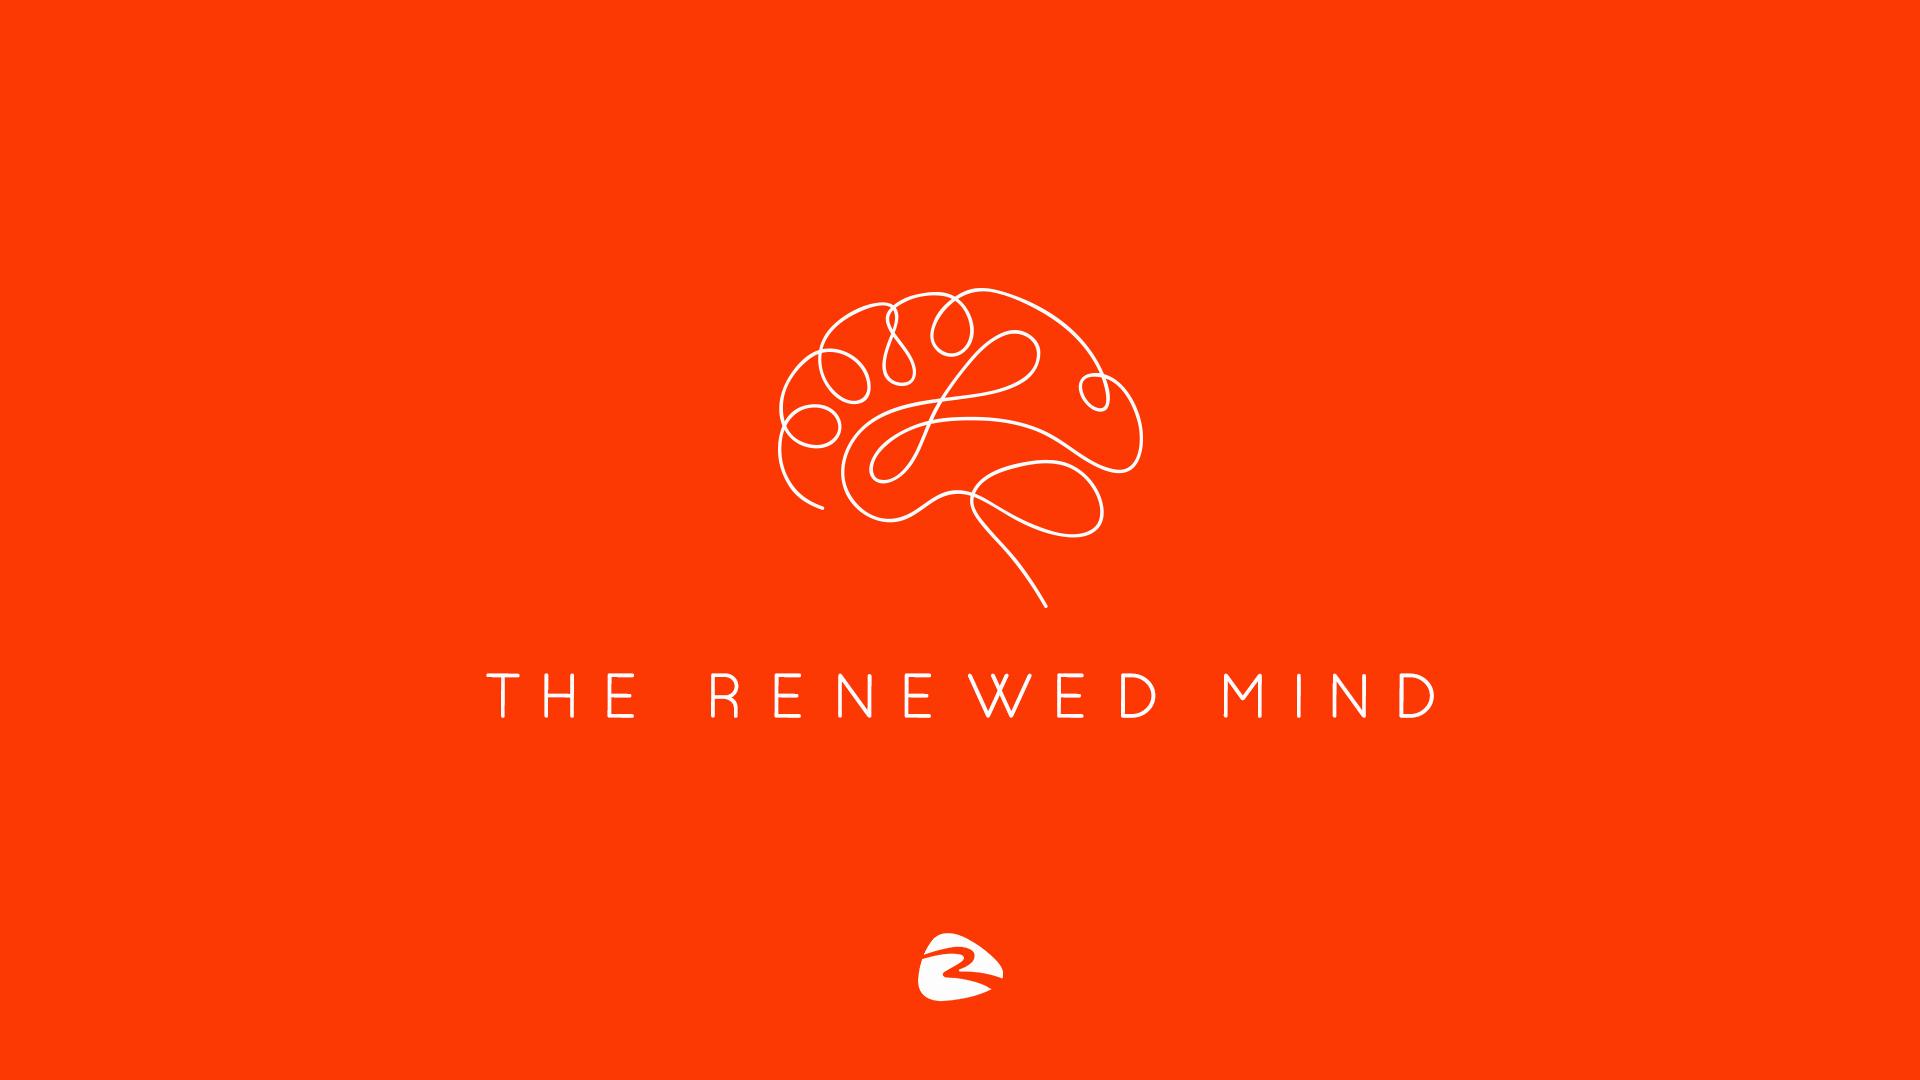 The Renewed Mind